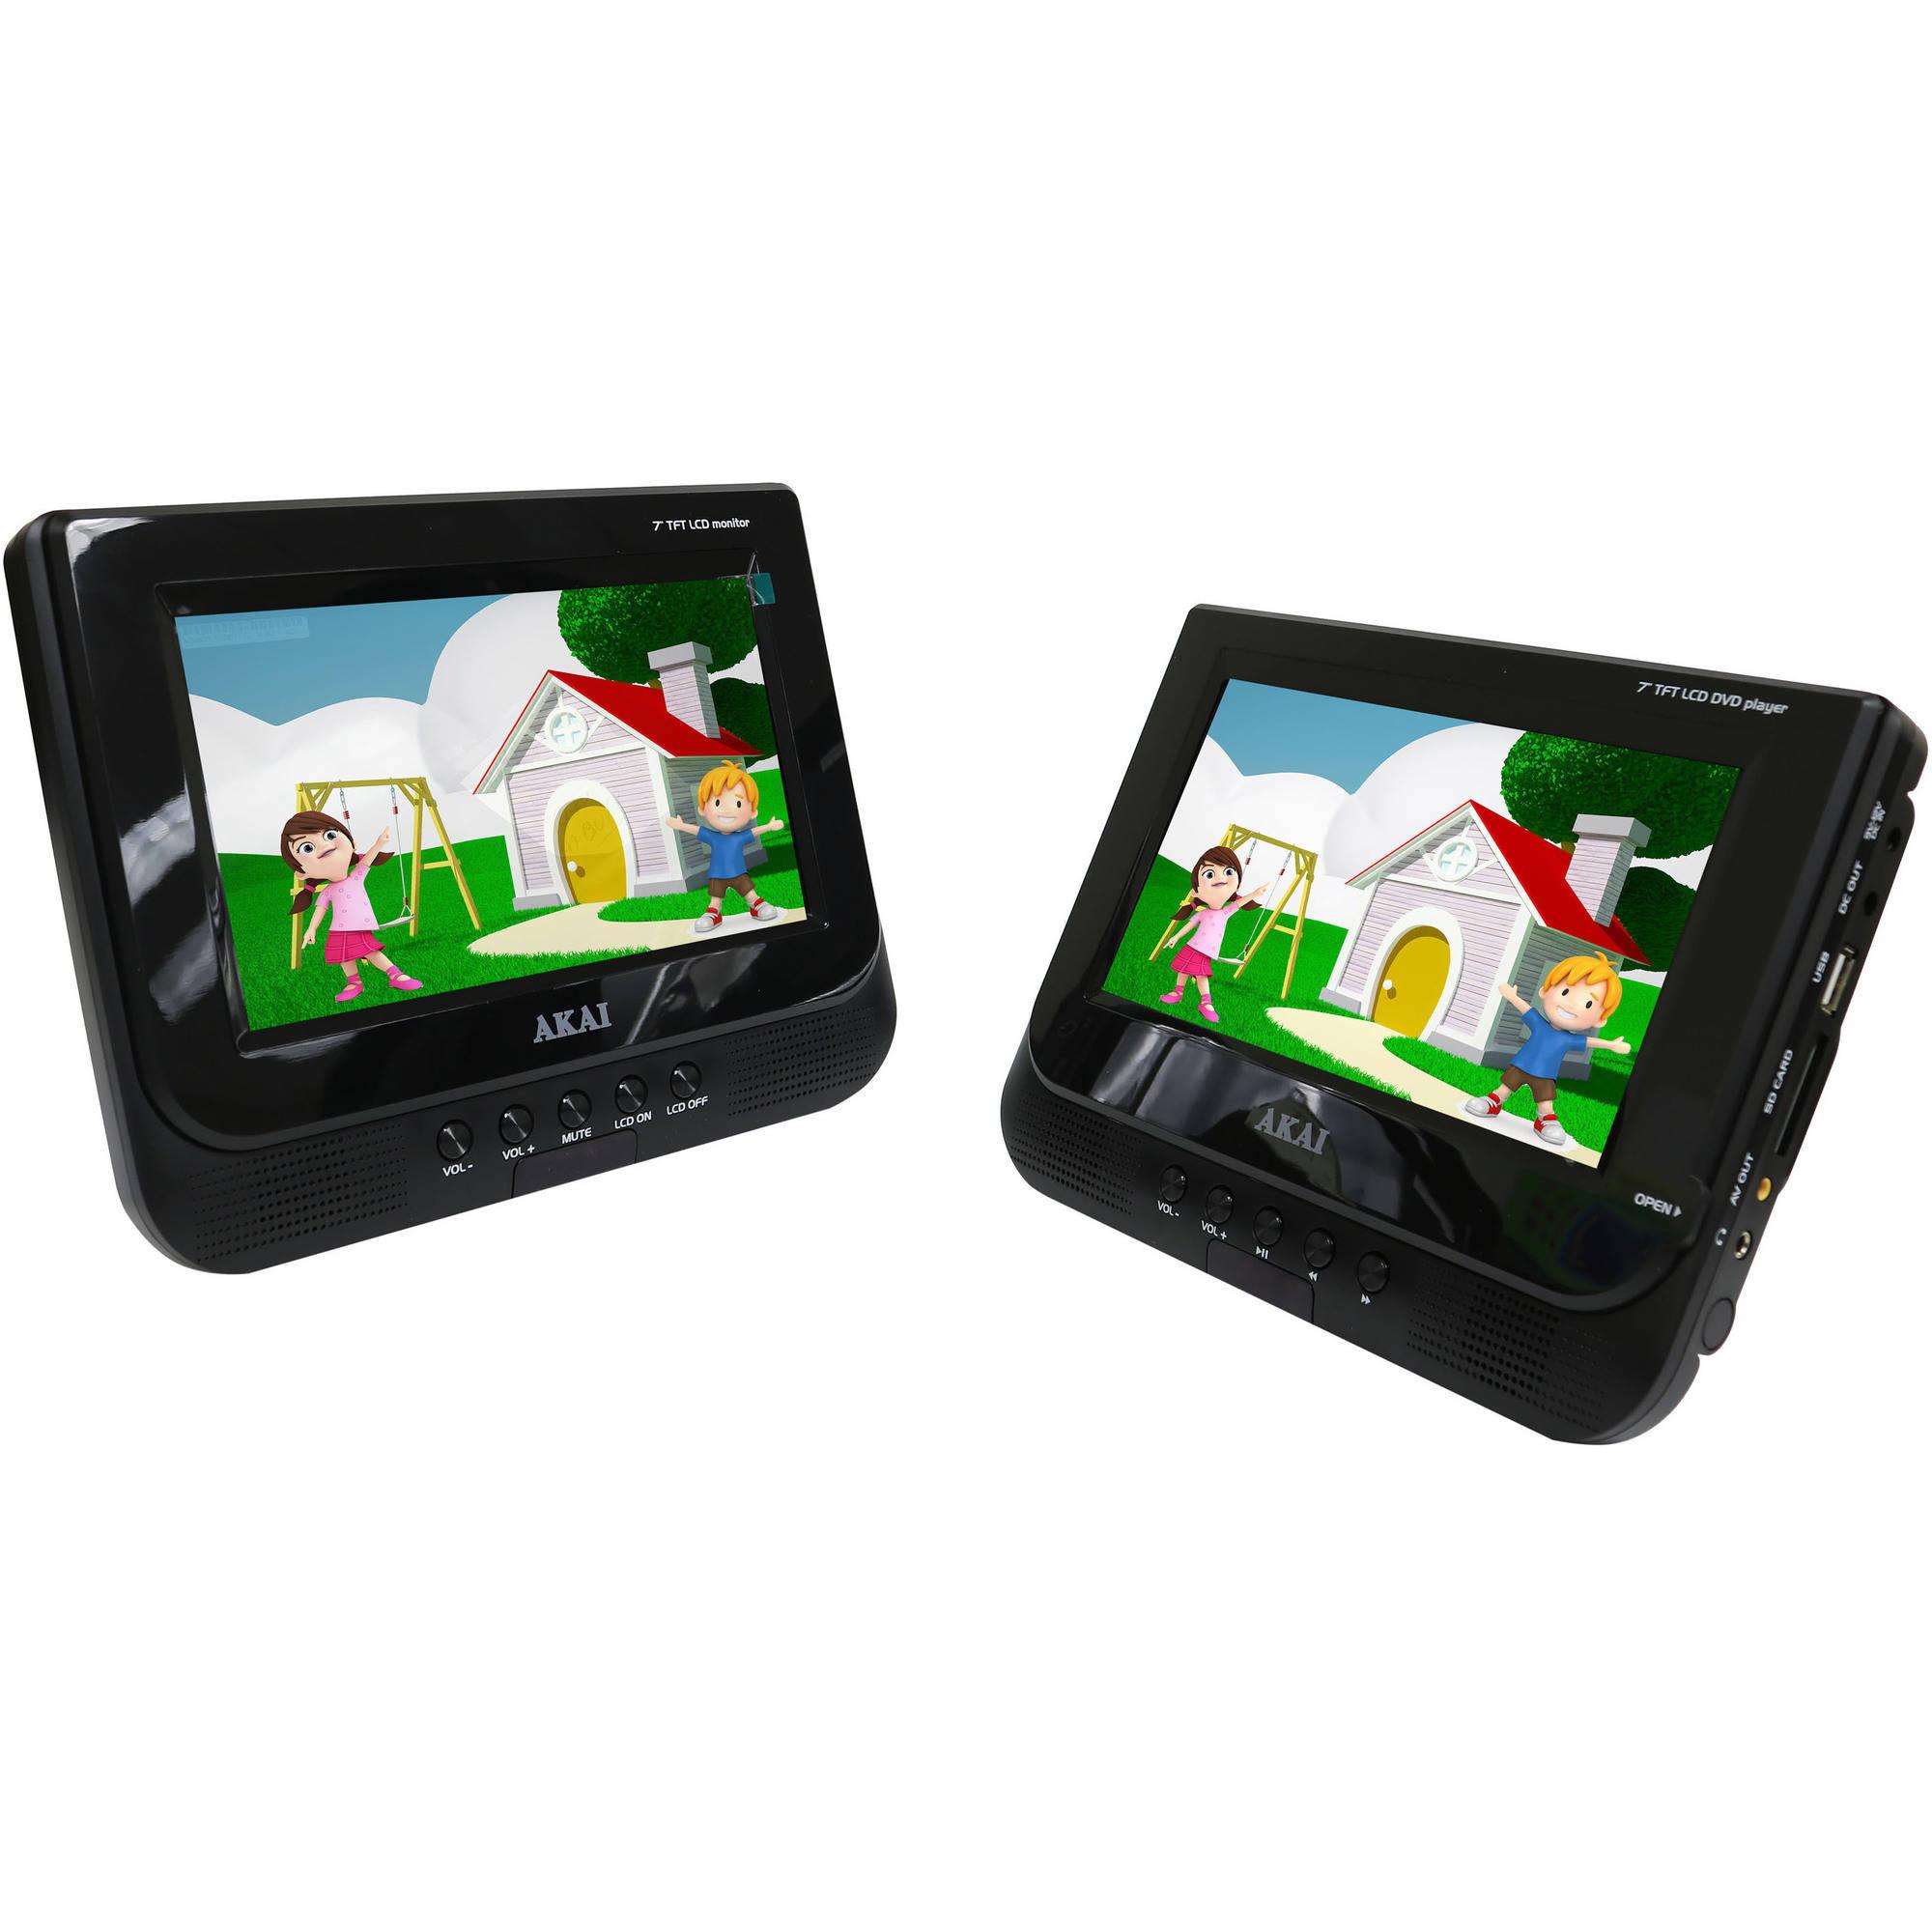 "Image of Akai AKPDVD702D 7"" Dual Screen Portable DVD Player"